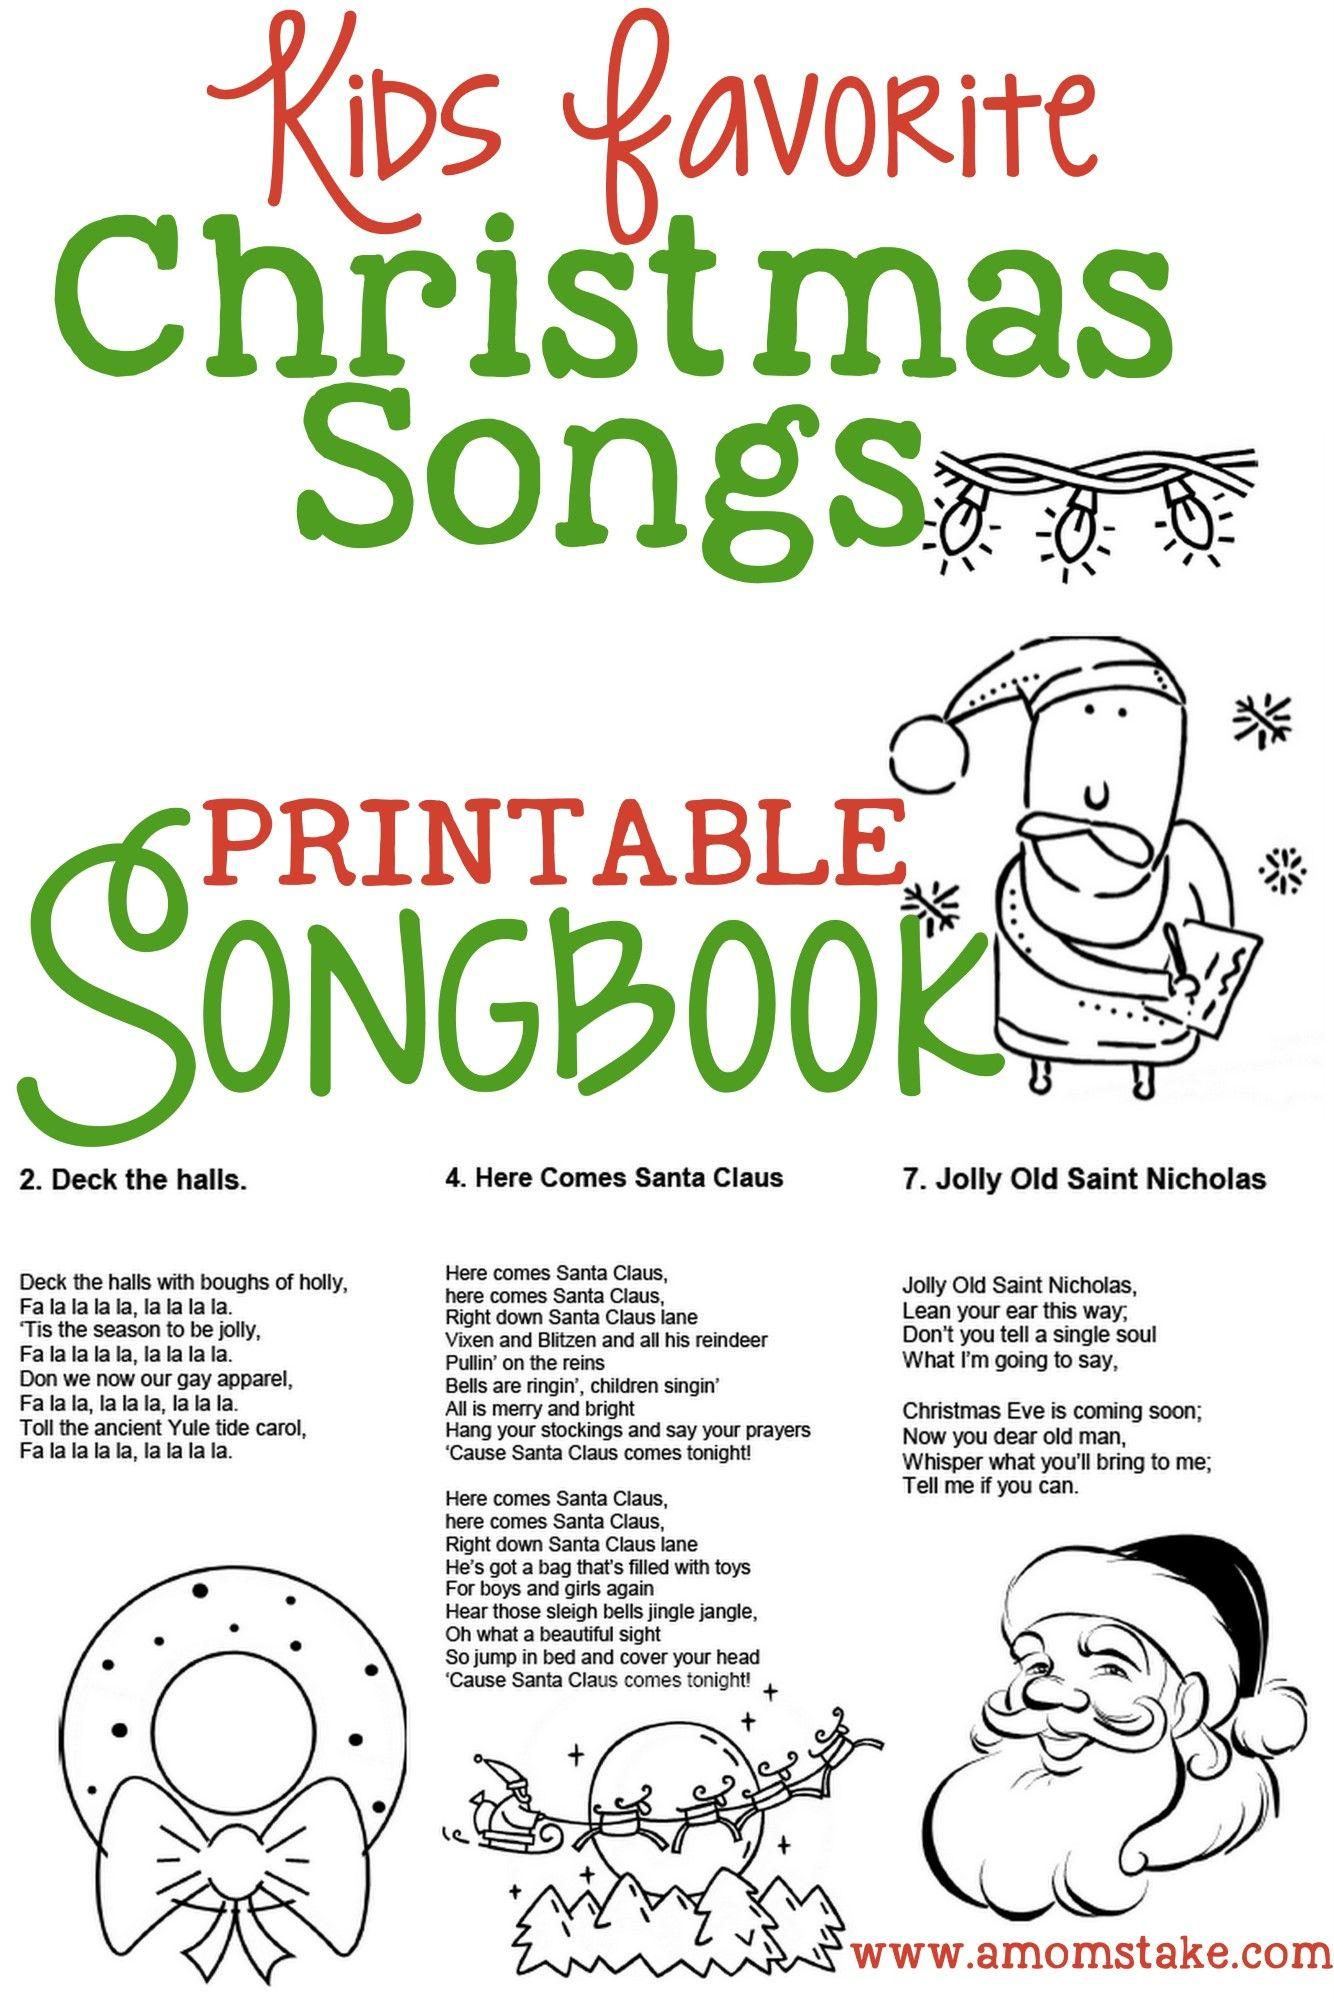 Christmas Songs For Kids – Free Printable Songbook! A Coloring Book - Christmas Song Lyrics Game Free Printable